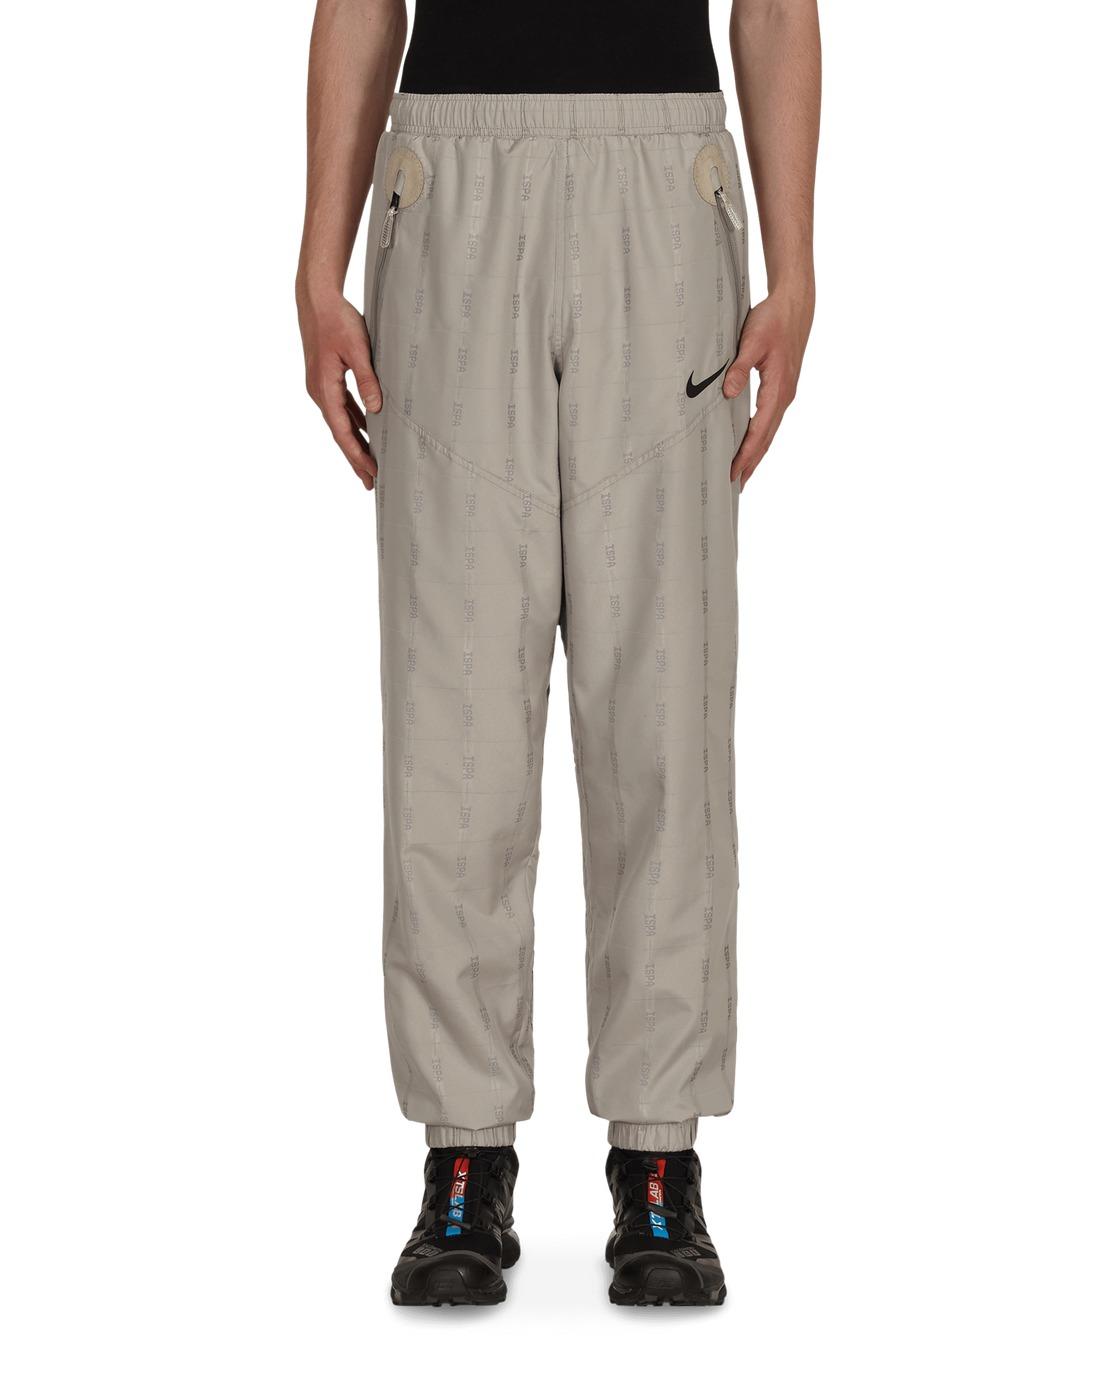 Photo: Nike Special Project Ispa Adjustable Pants College Grey/Dark Grey